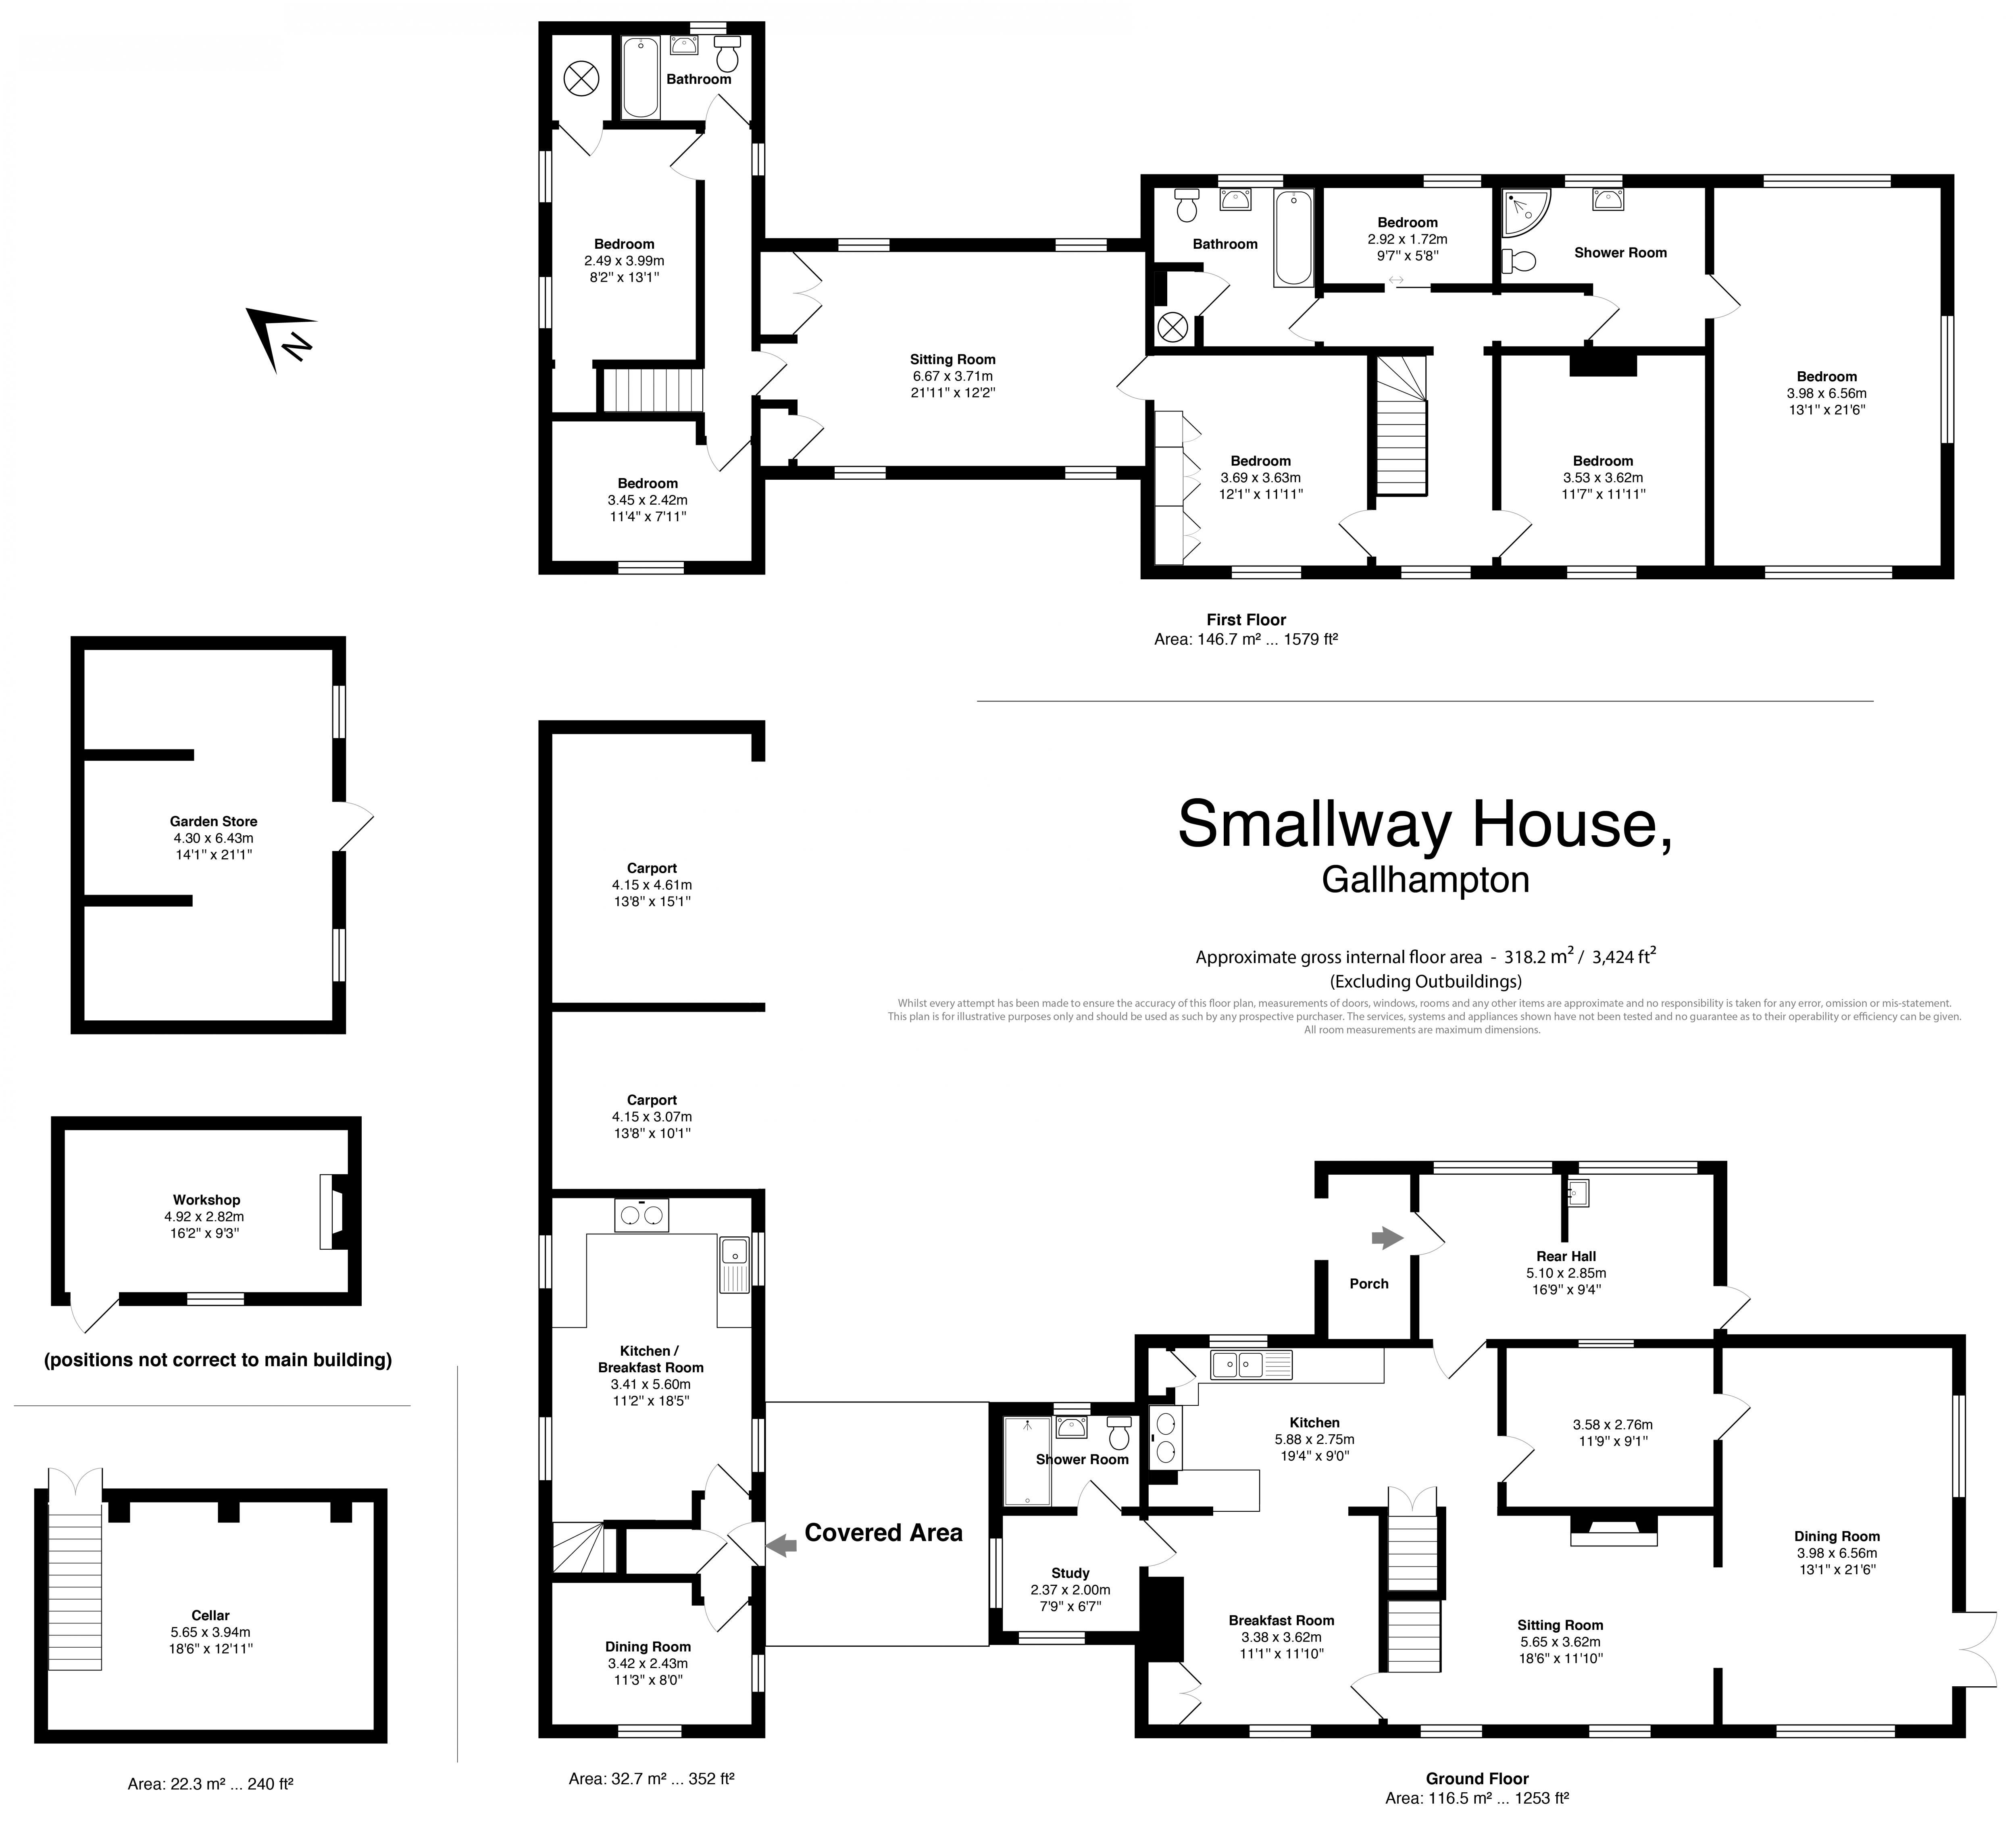 Smallway House floorplan